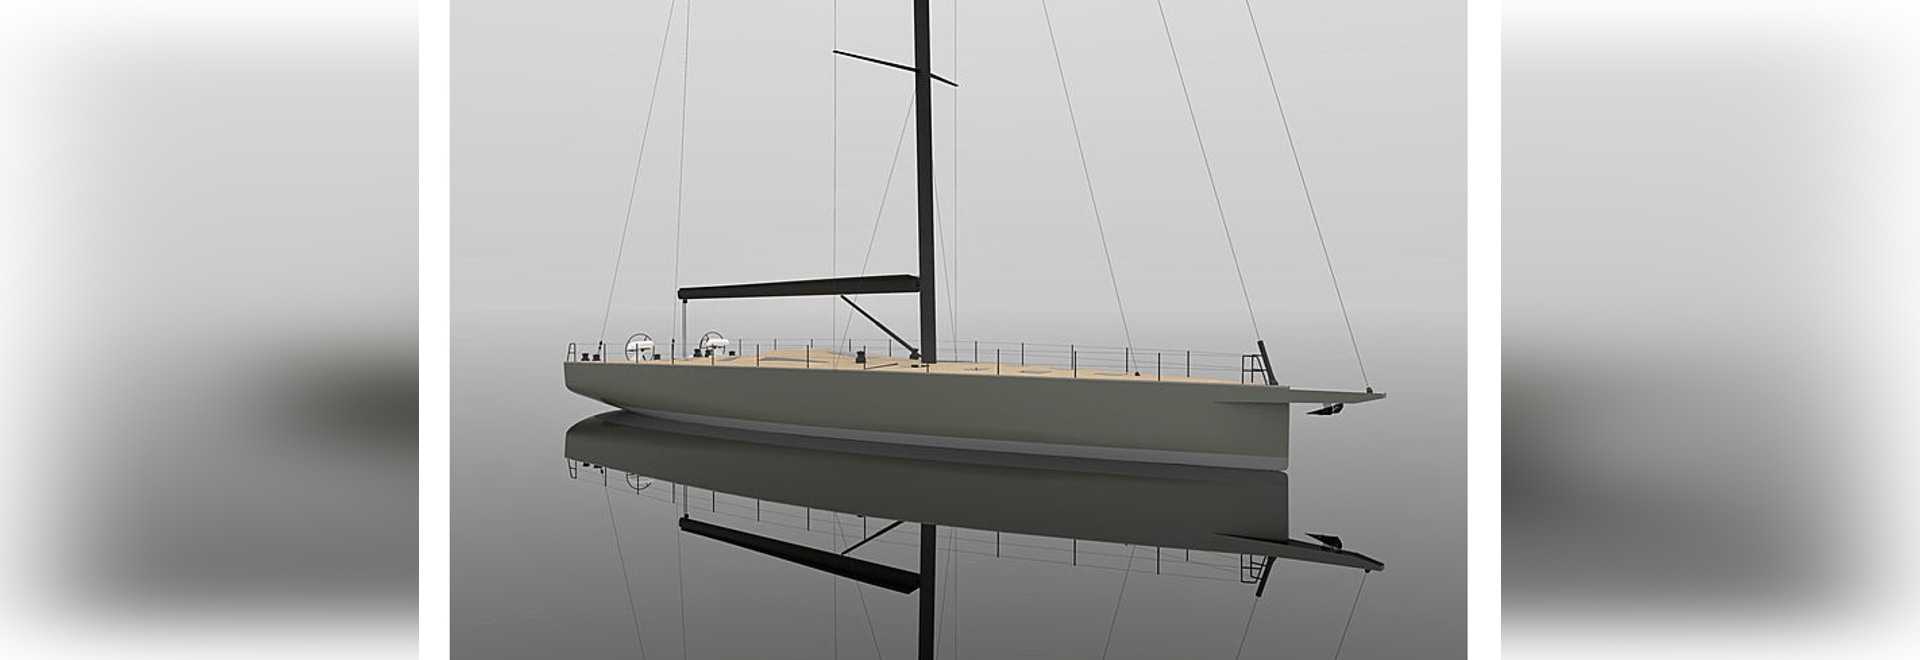 Vismara develops 26m in-build sailing yacht Momi 80